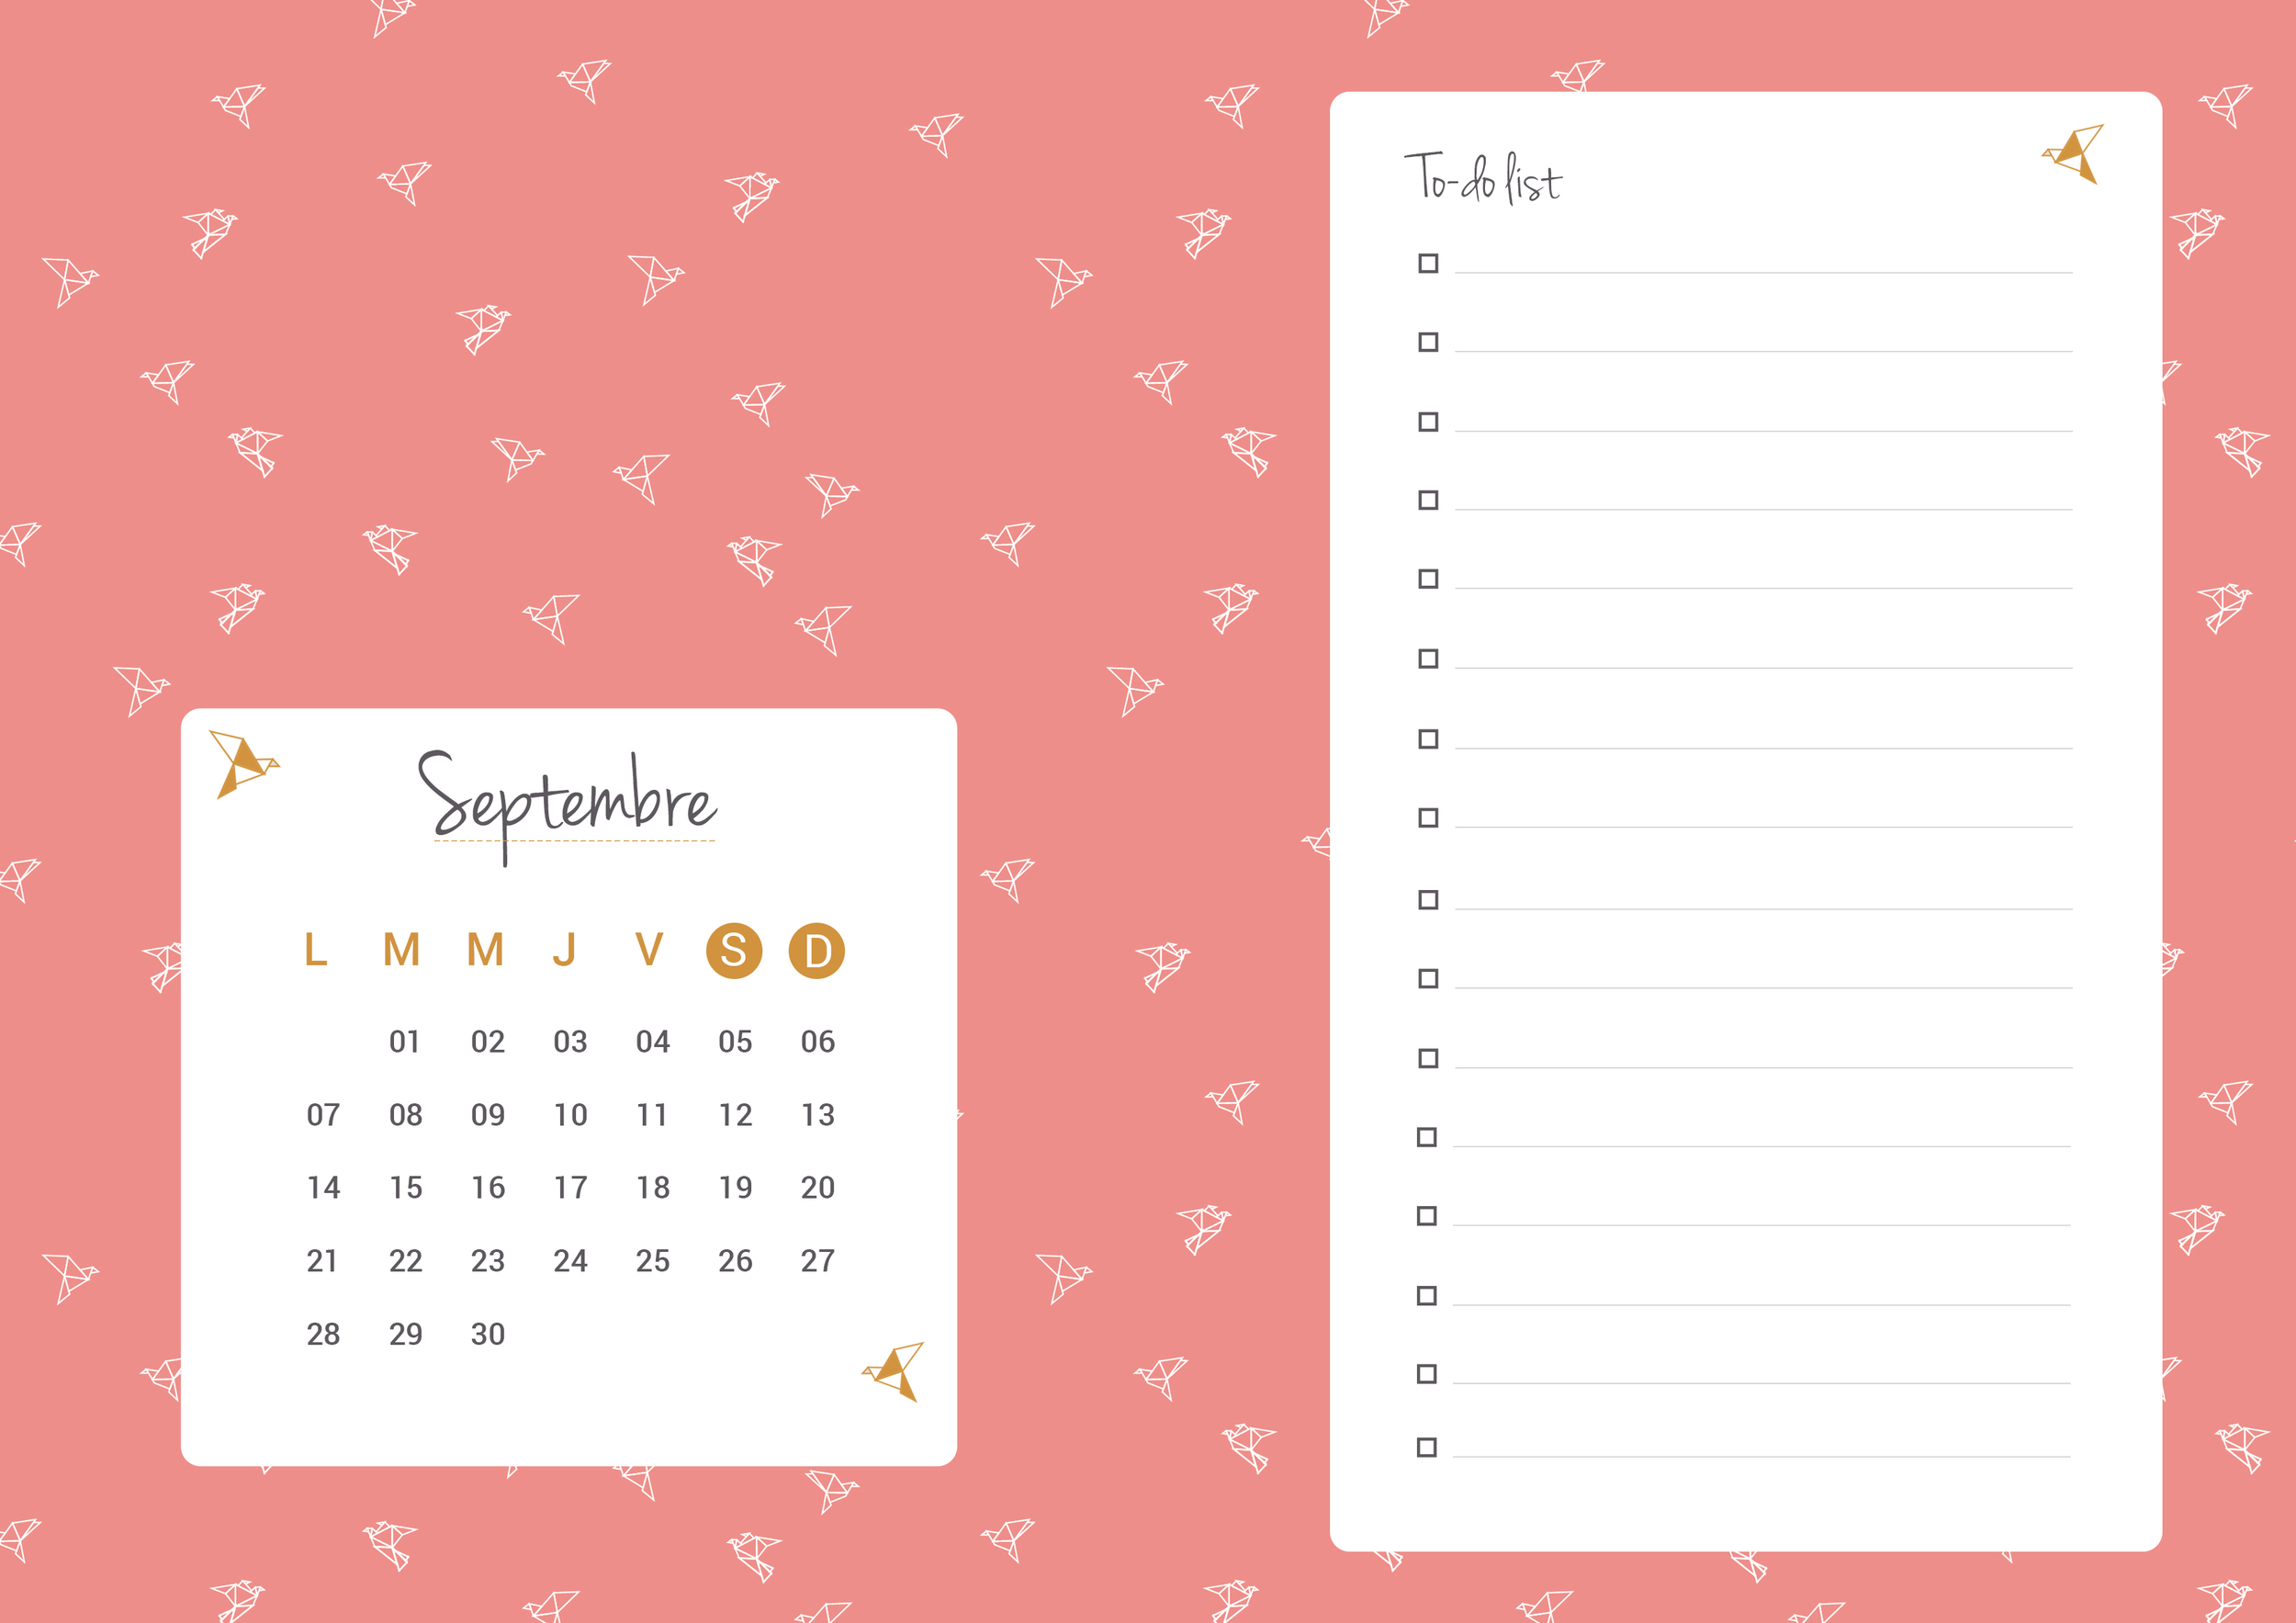 Planning Septembre 2015 - HelloNobo.com